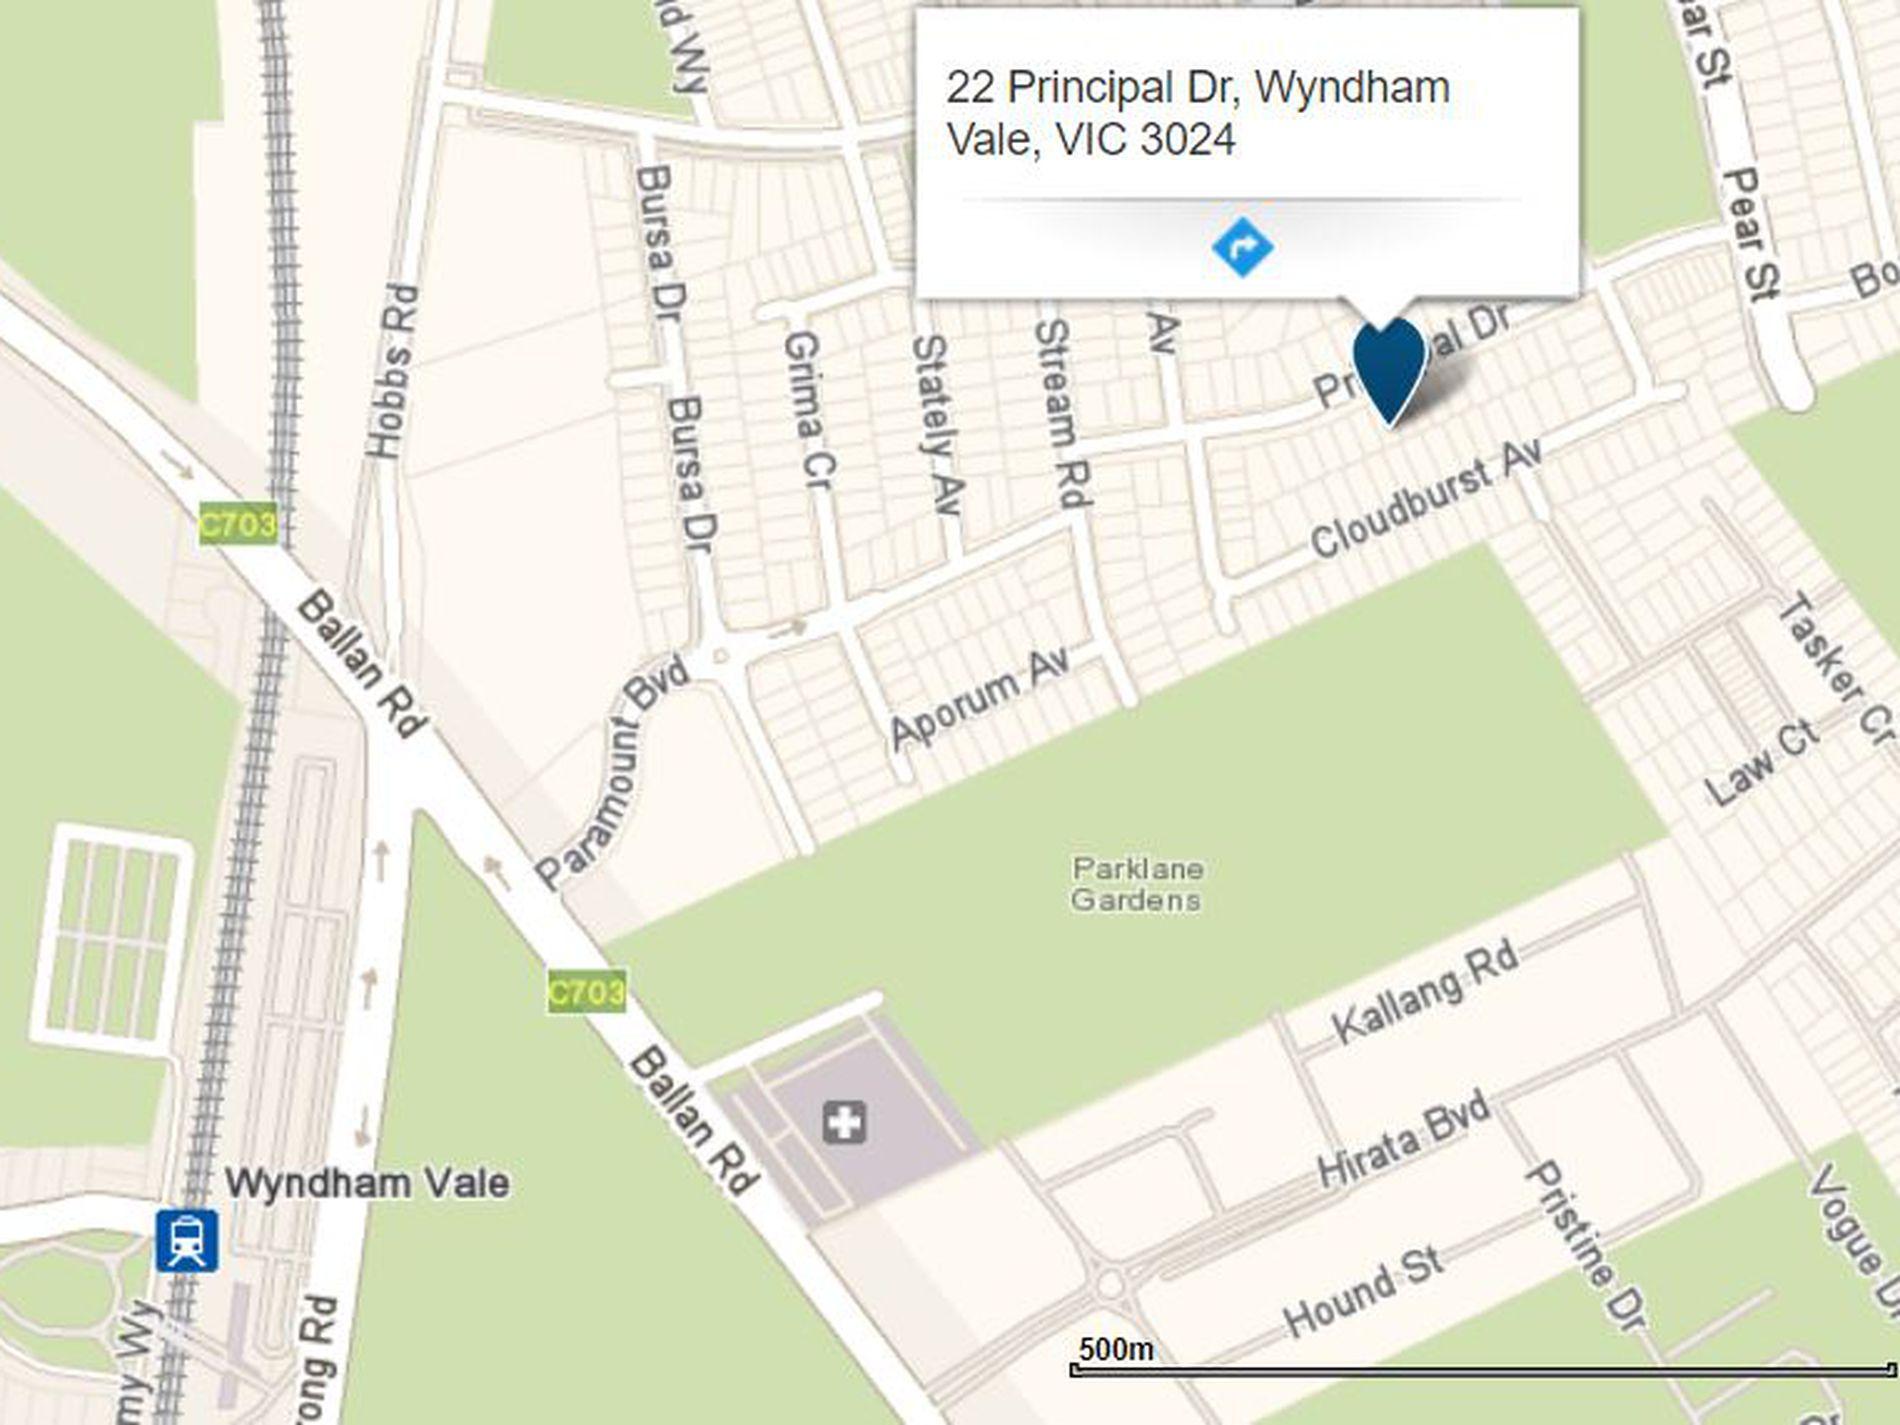 22 Principal Drive, Wyndham Vale